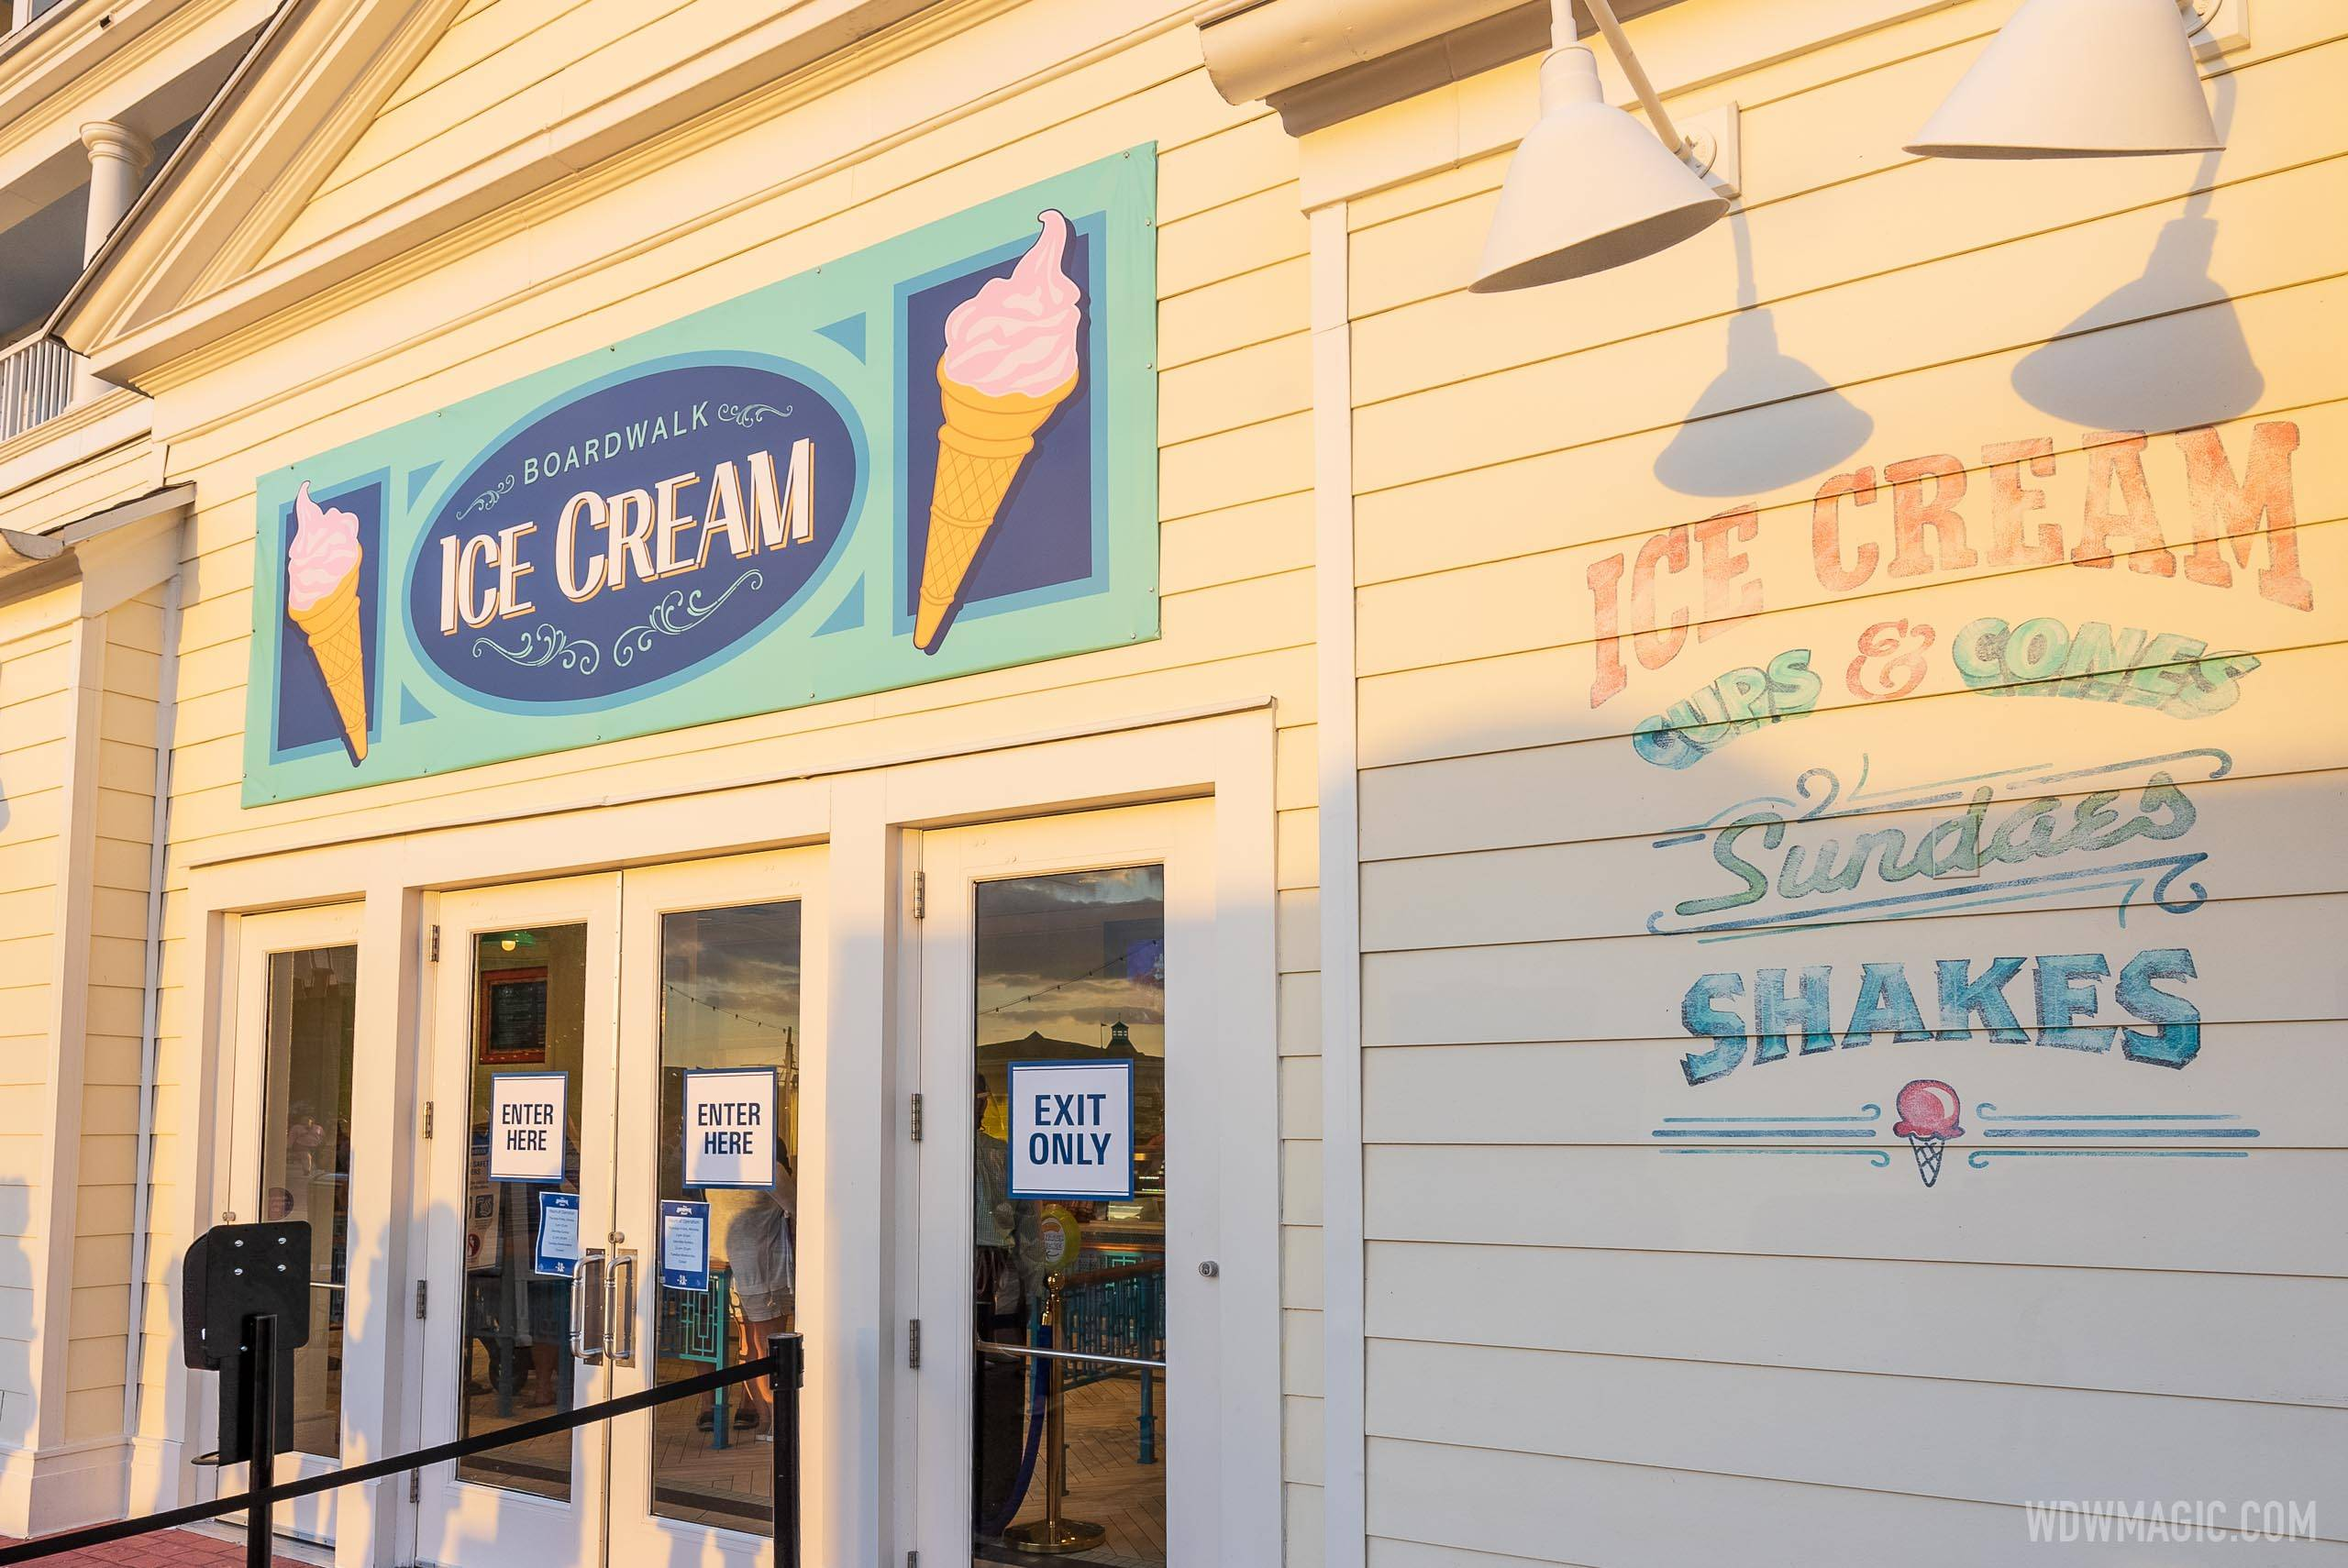 BoardWalk Ice Cream overview